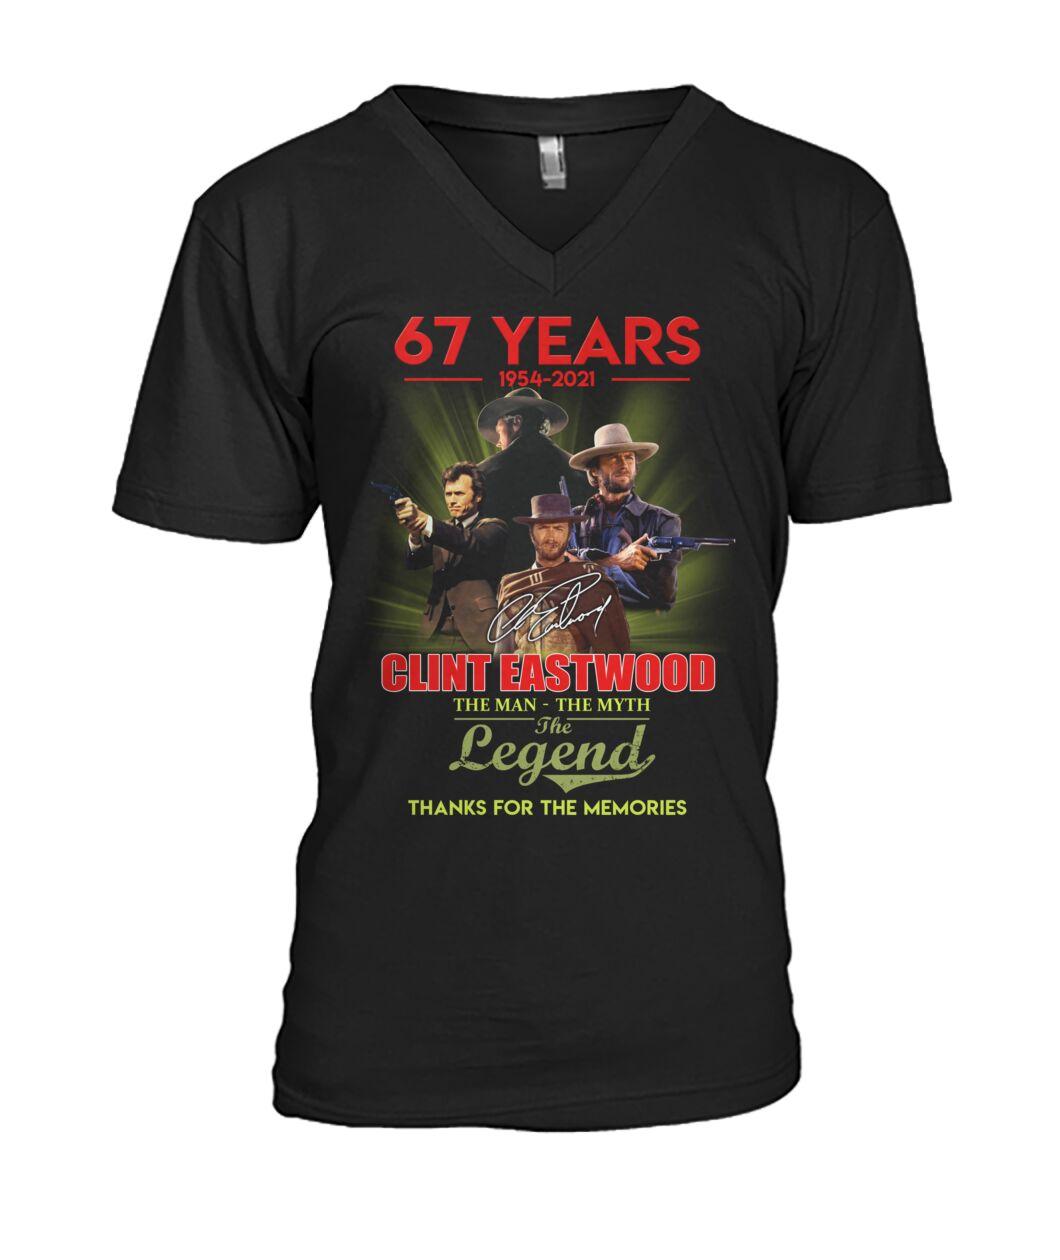 Luxury 67 Years Clint Eastwood Shirt